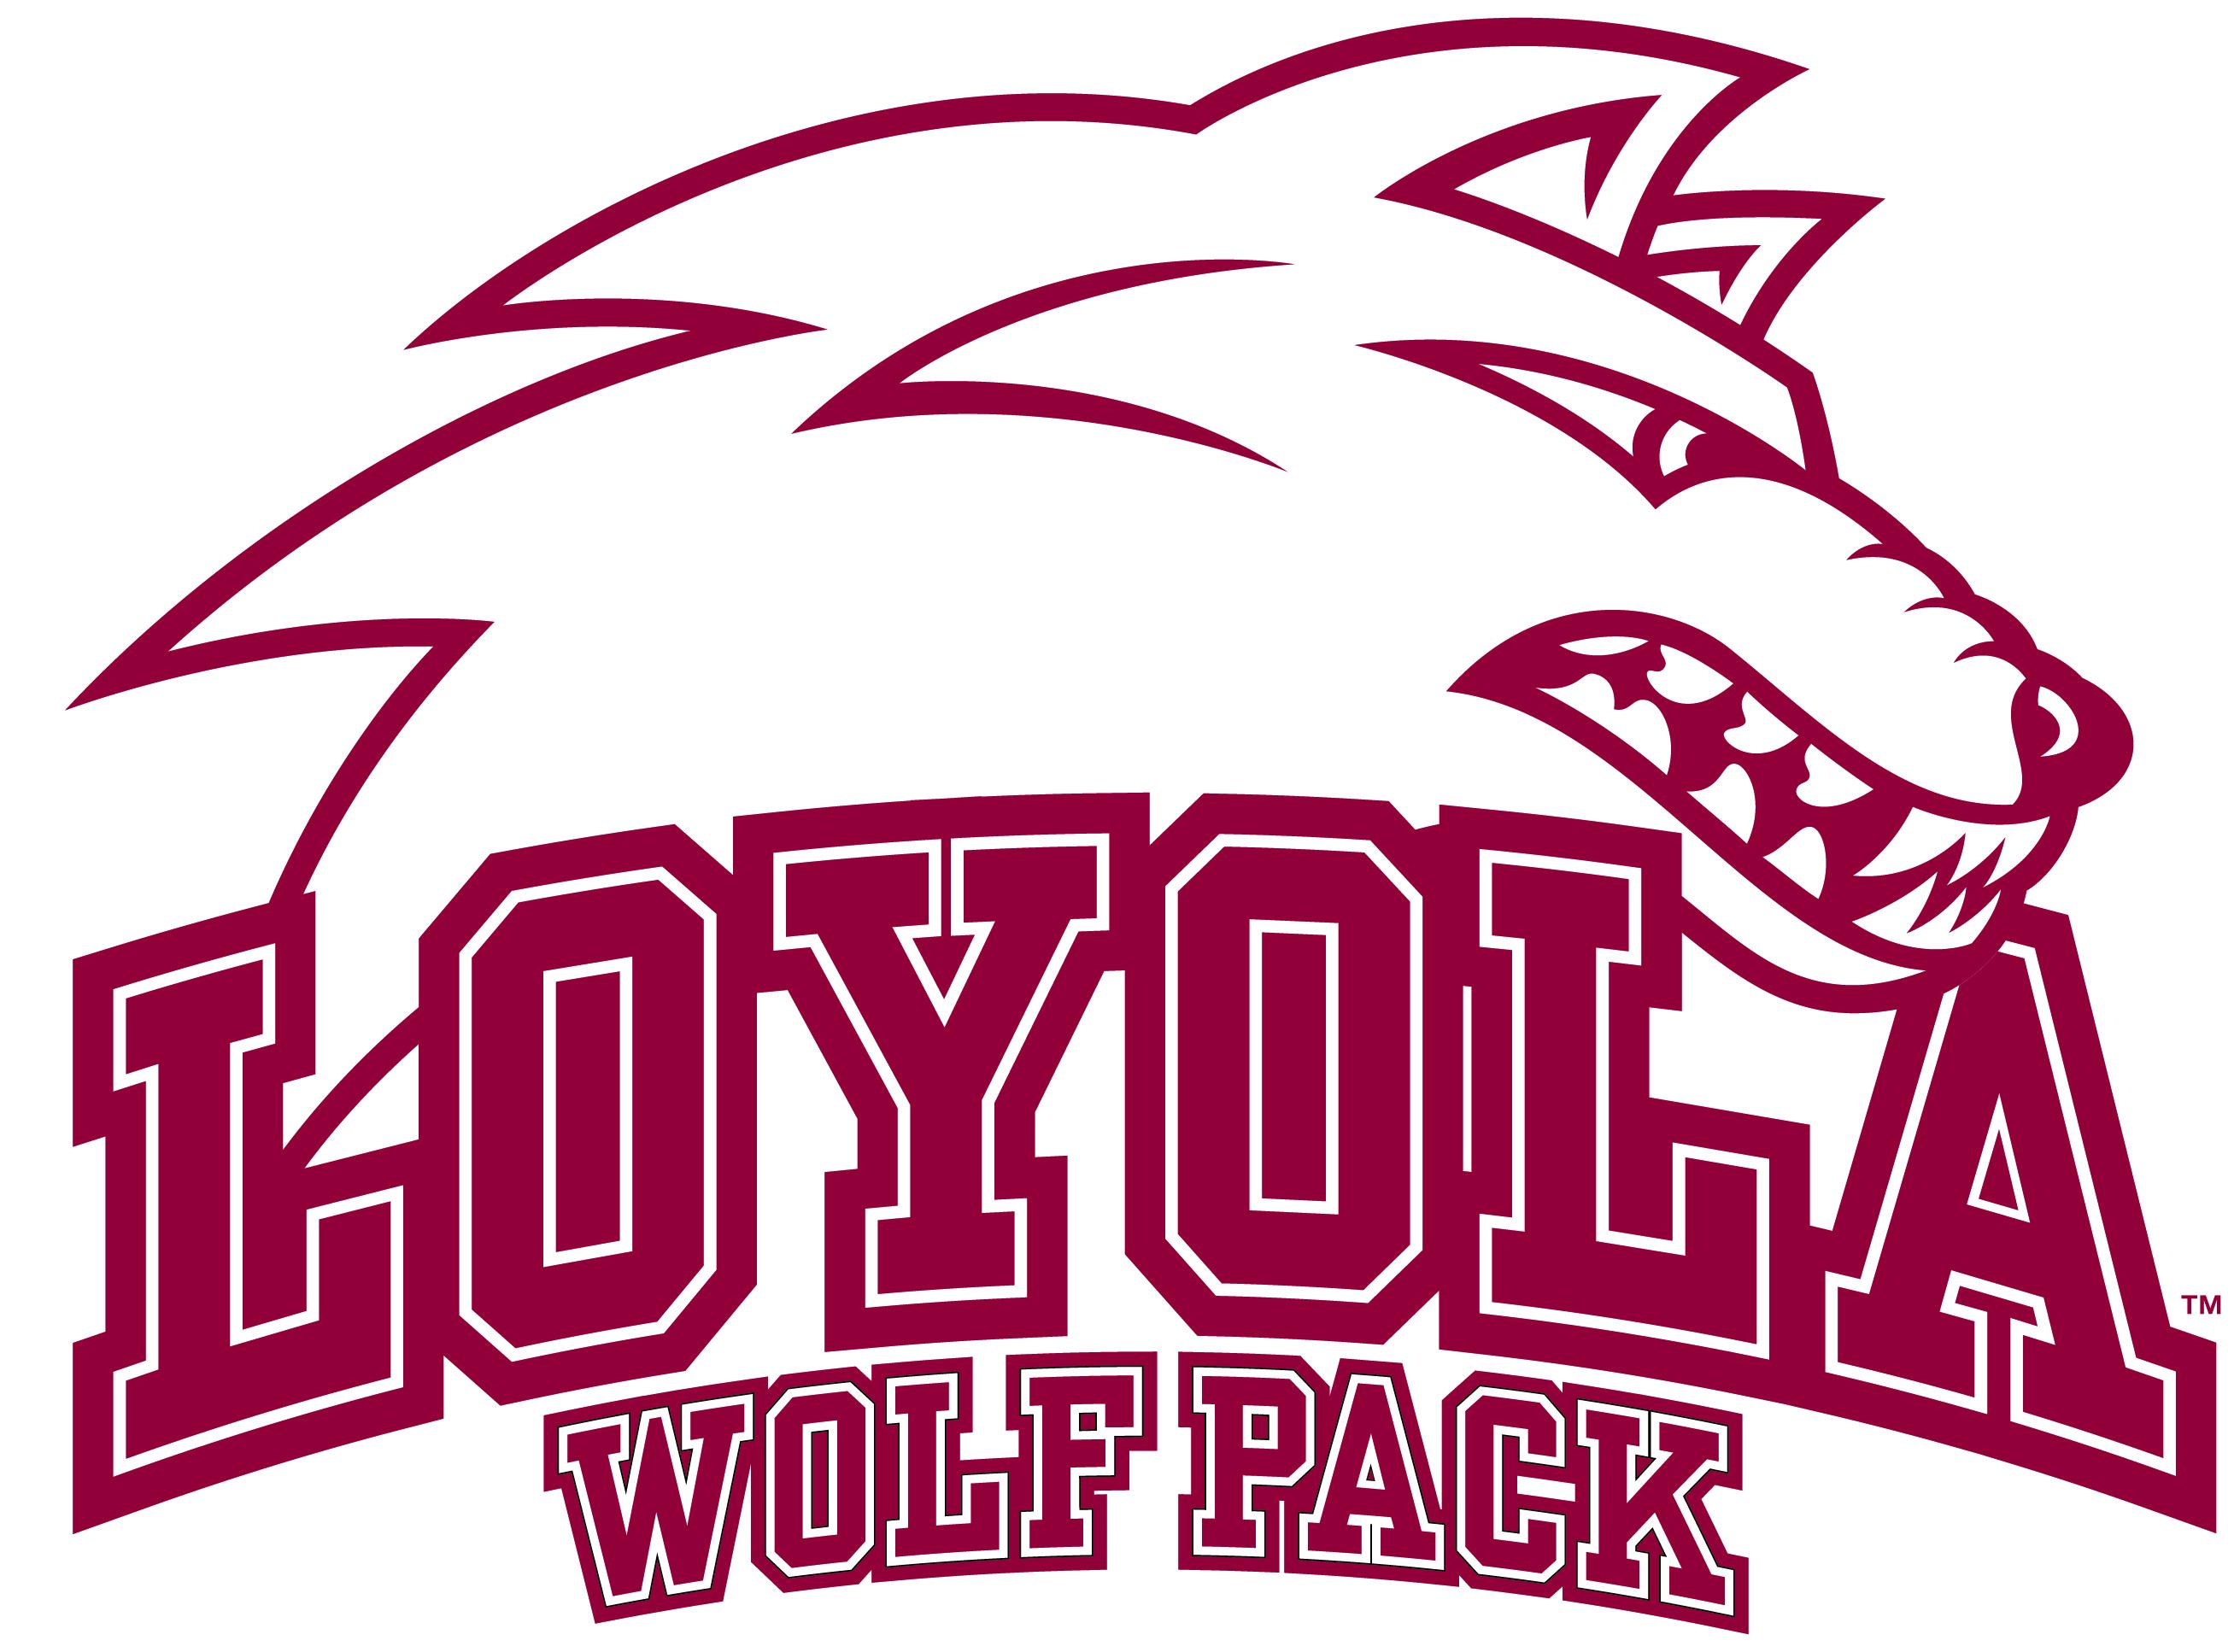 Loyola Wolf Pack logo